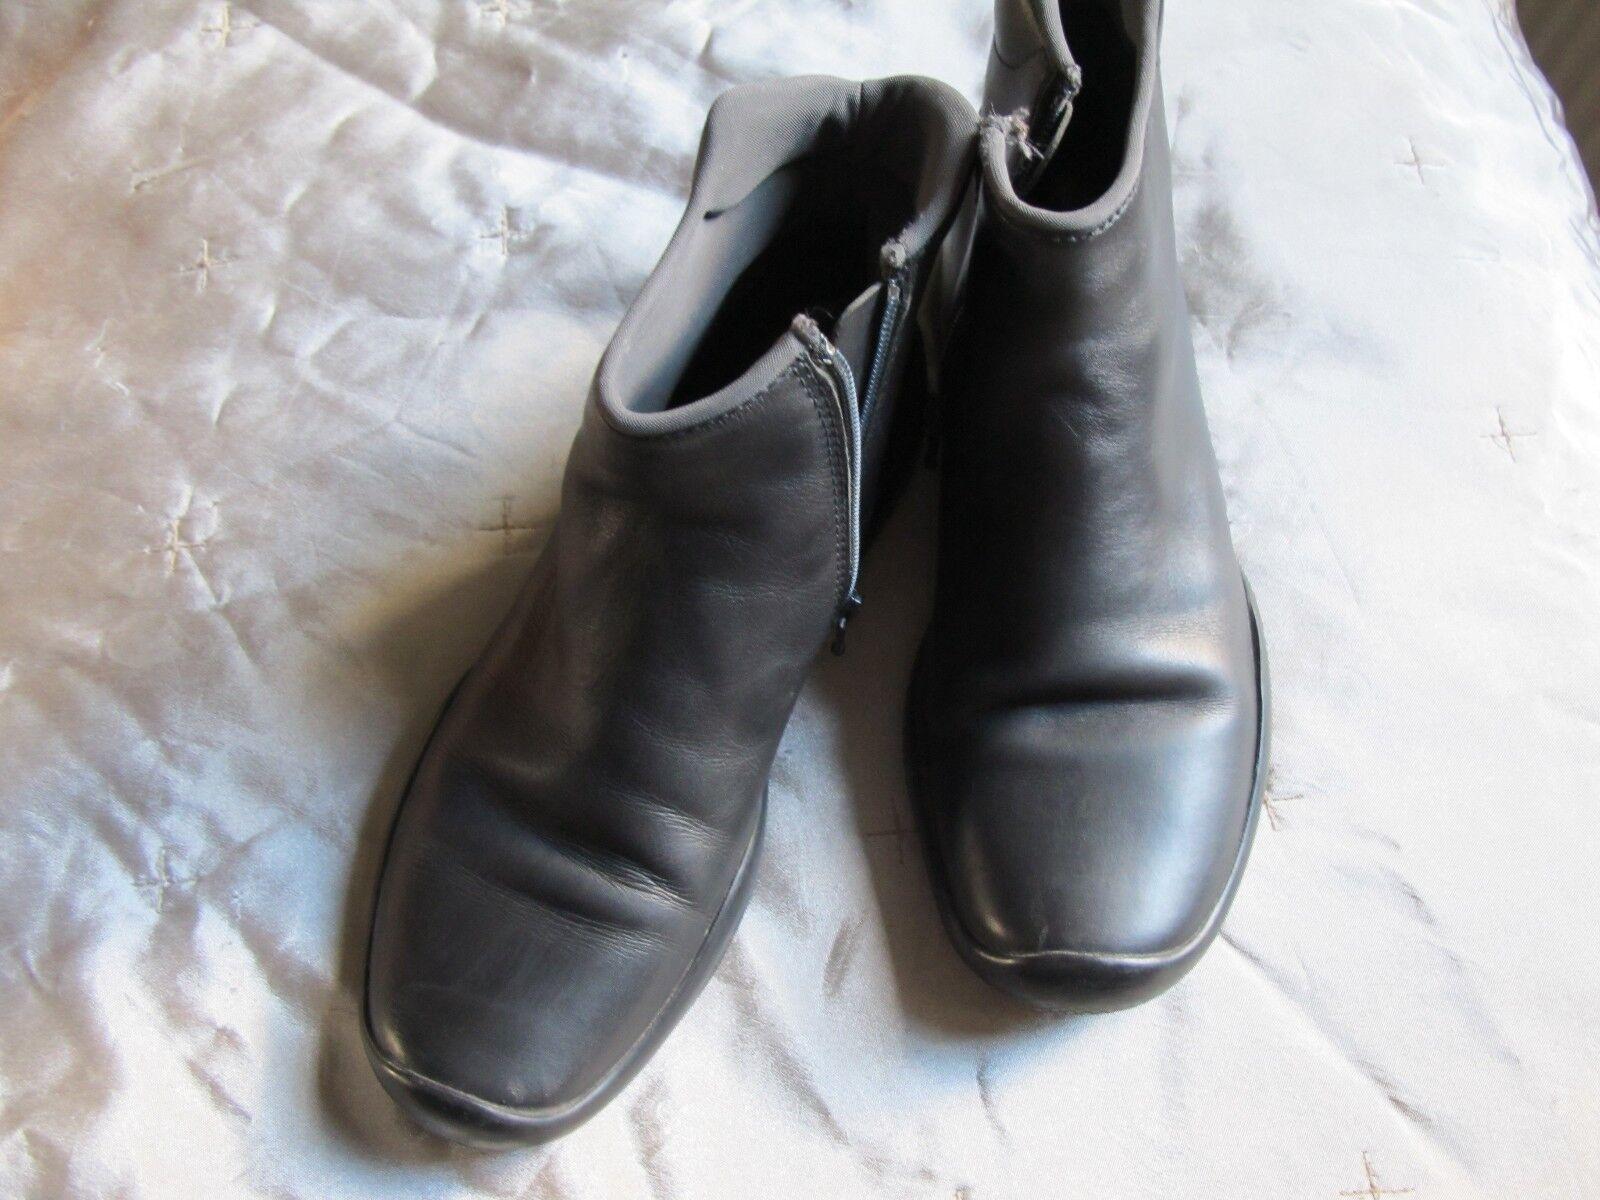 Luxus Prada  Gr 35 Stiefeletten  Prada booties Schuhe schuhe schwarz 86b7f2